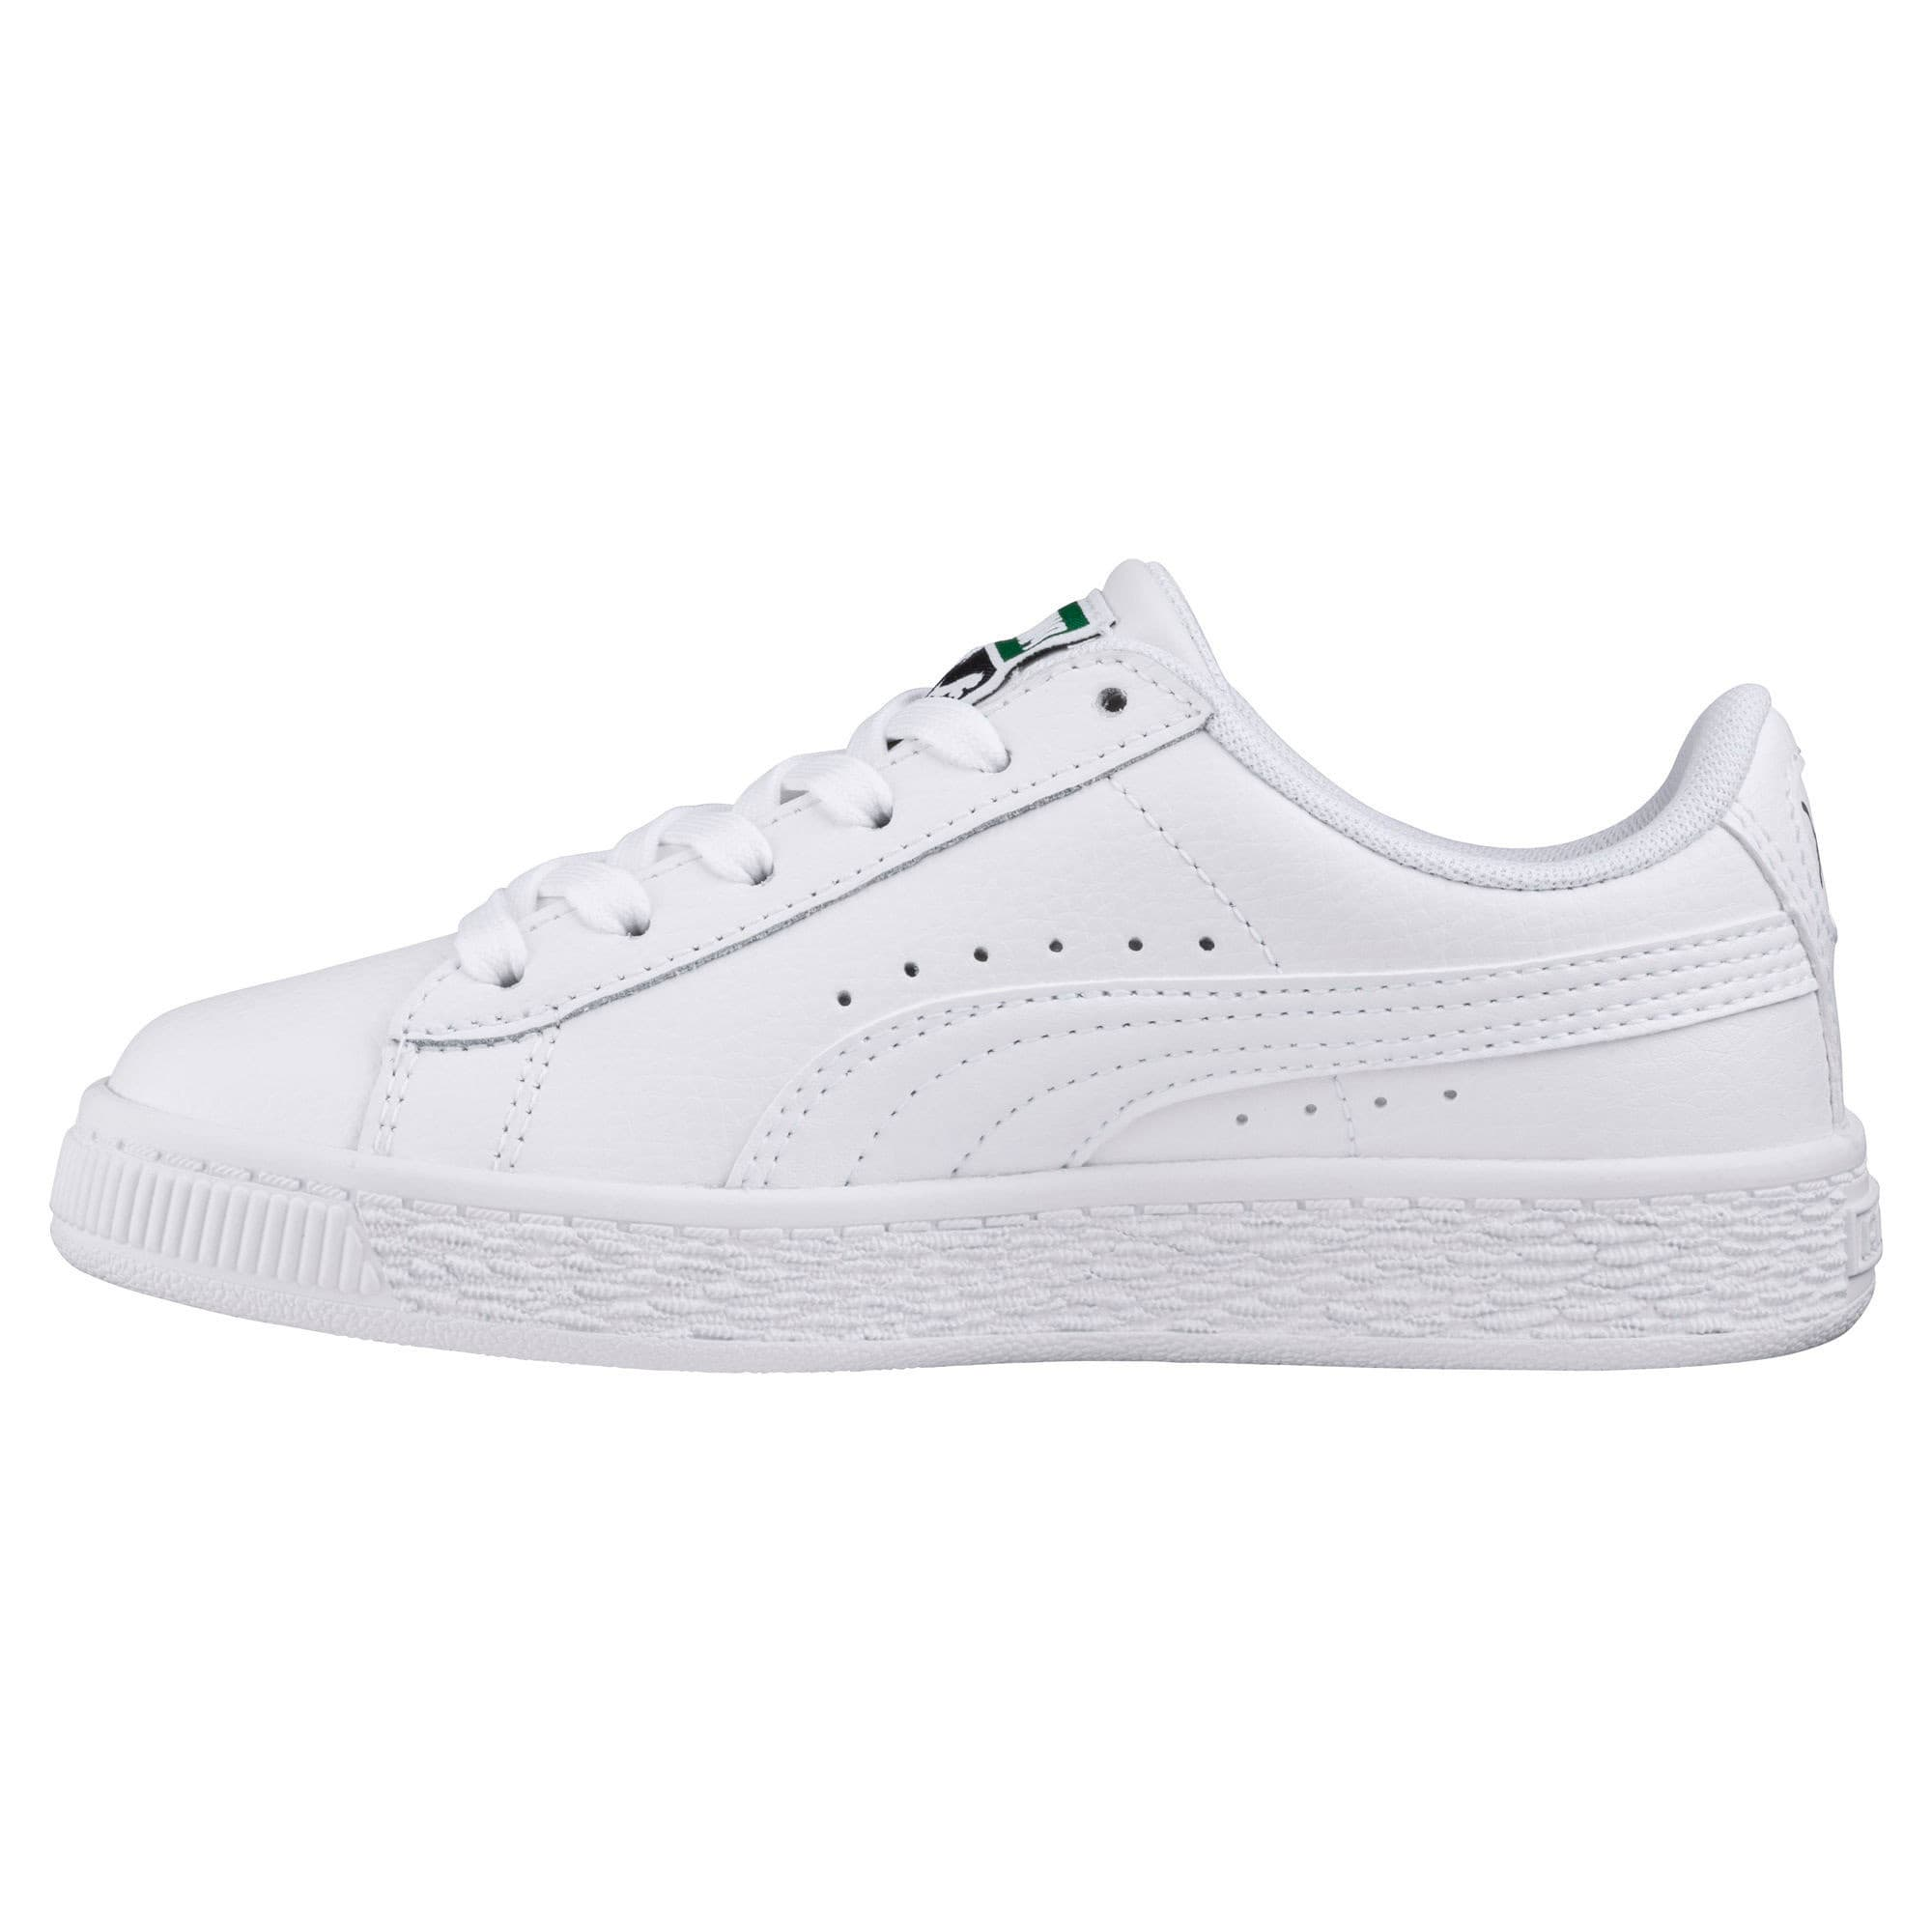 Thumbnail 1 of Basket Classic Sneakers JR, Puma White-Puma White, medium